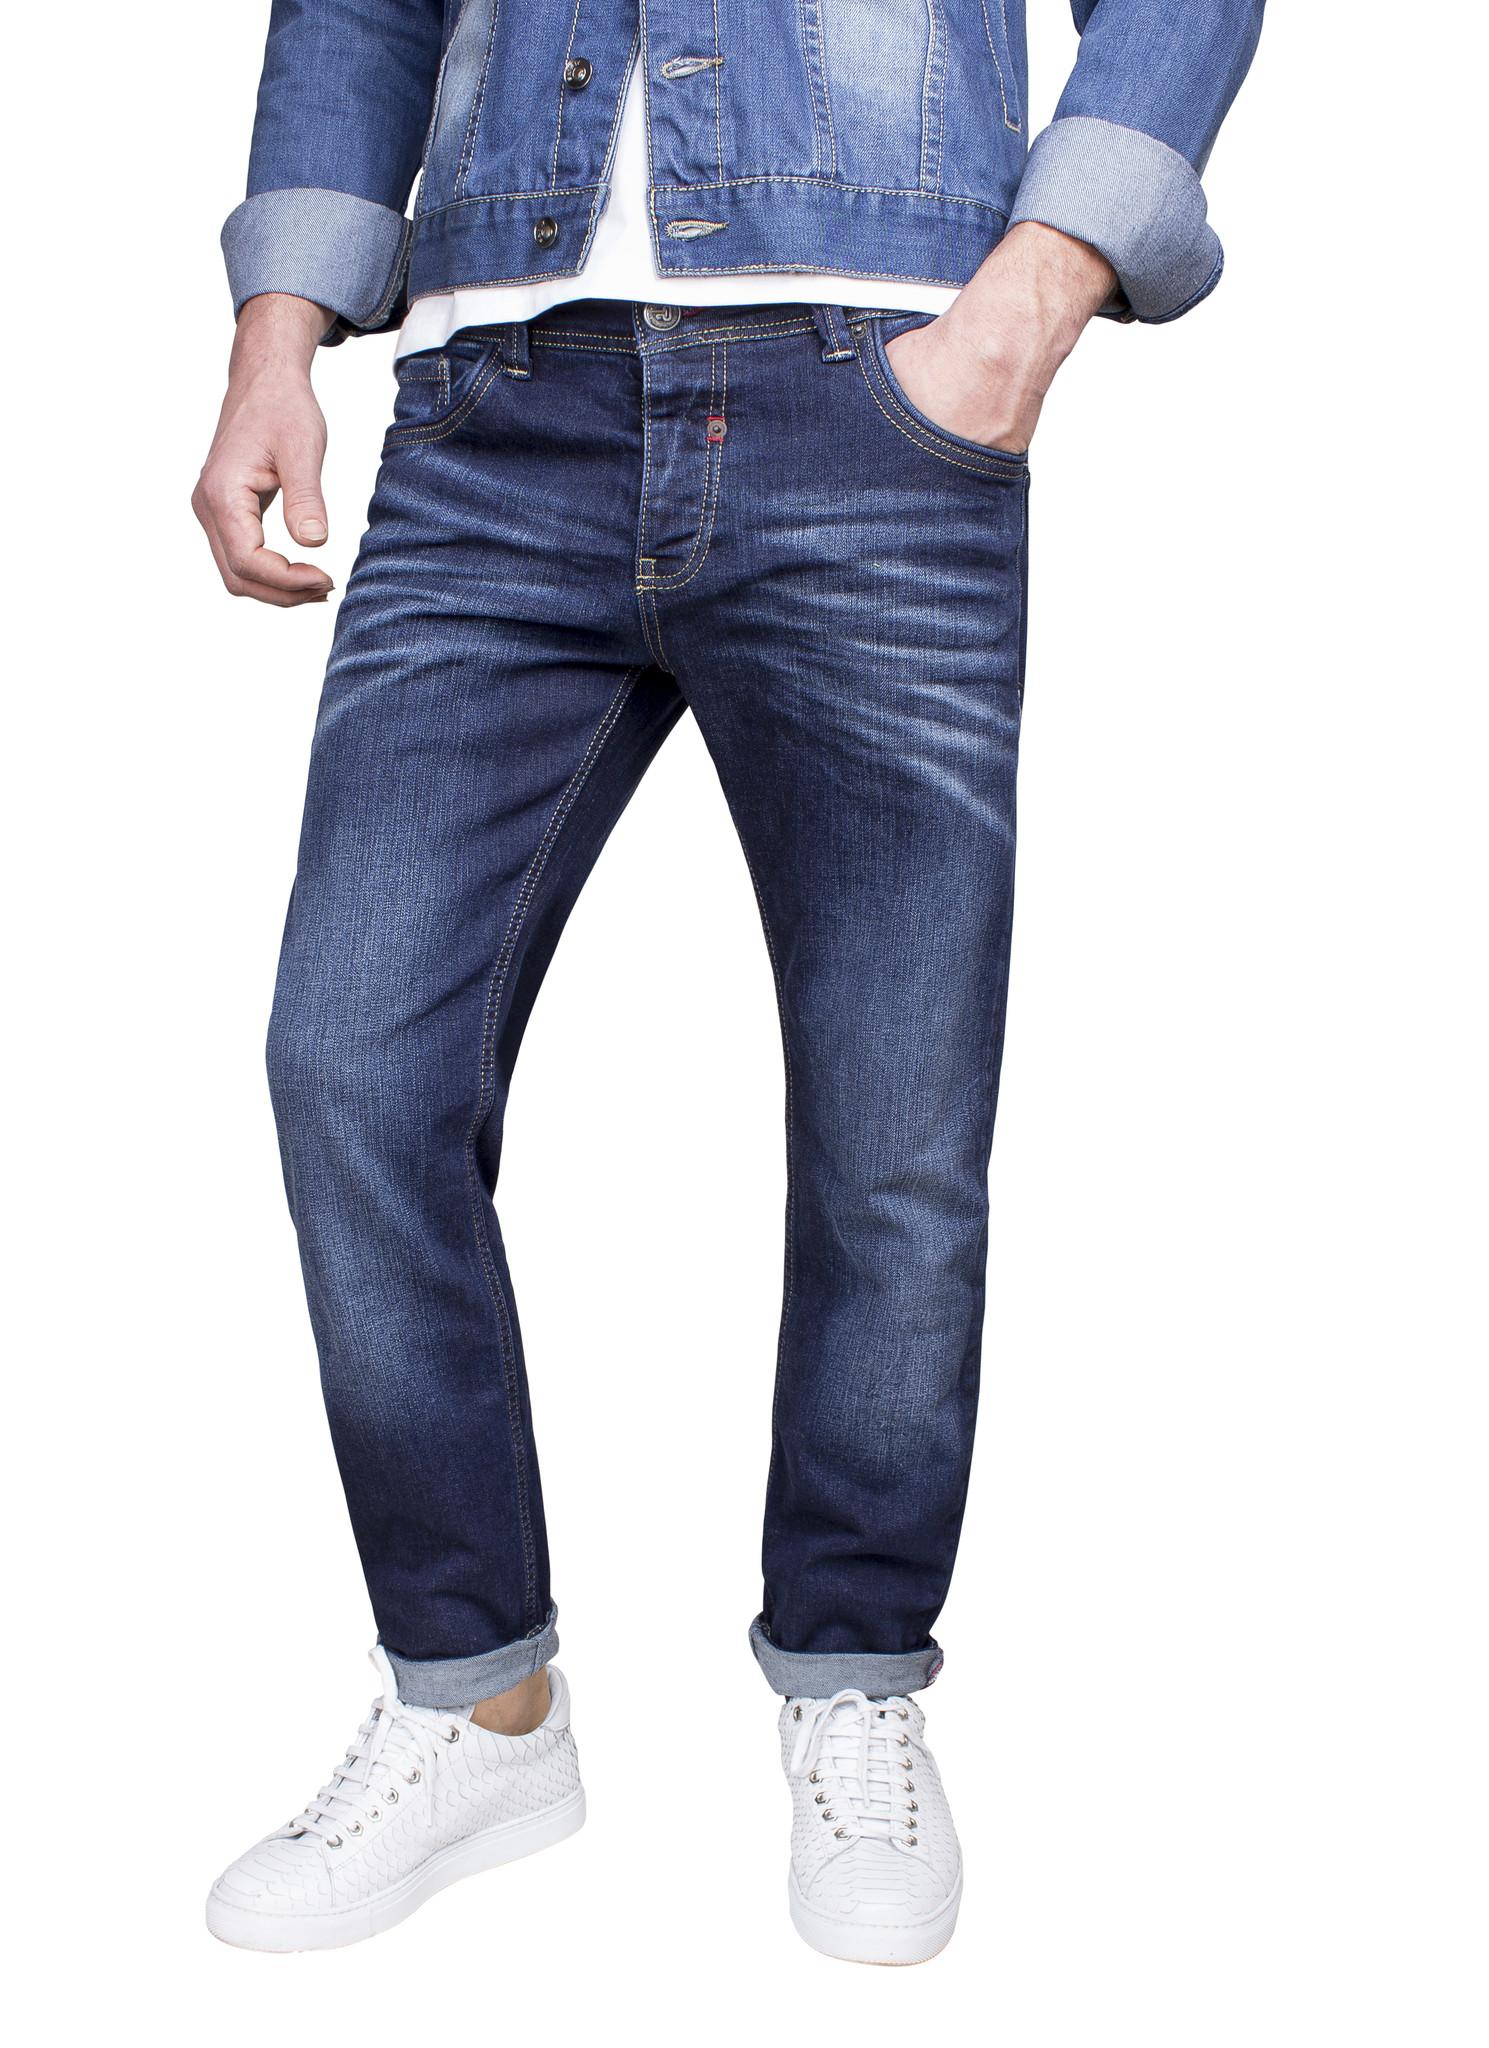 Arya Boy Jeans 82068 Dark Navy Maat: 36/34